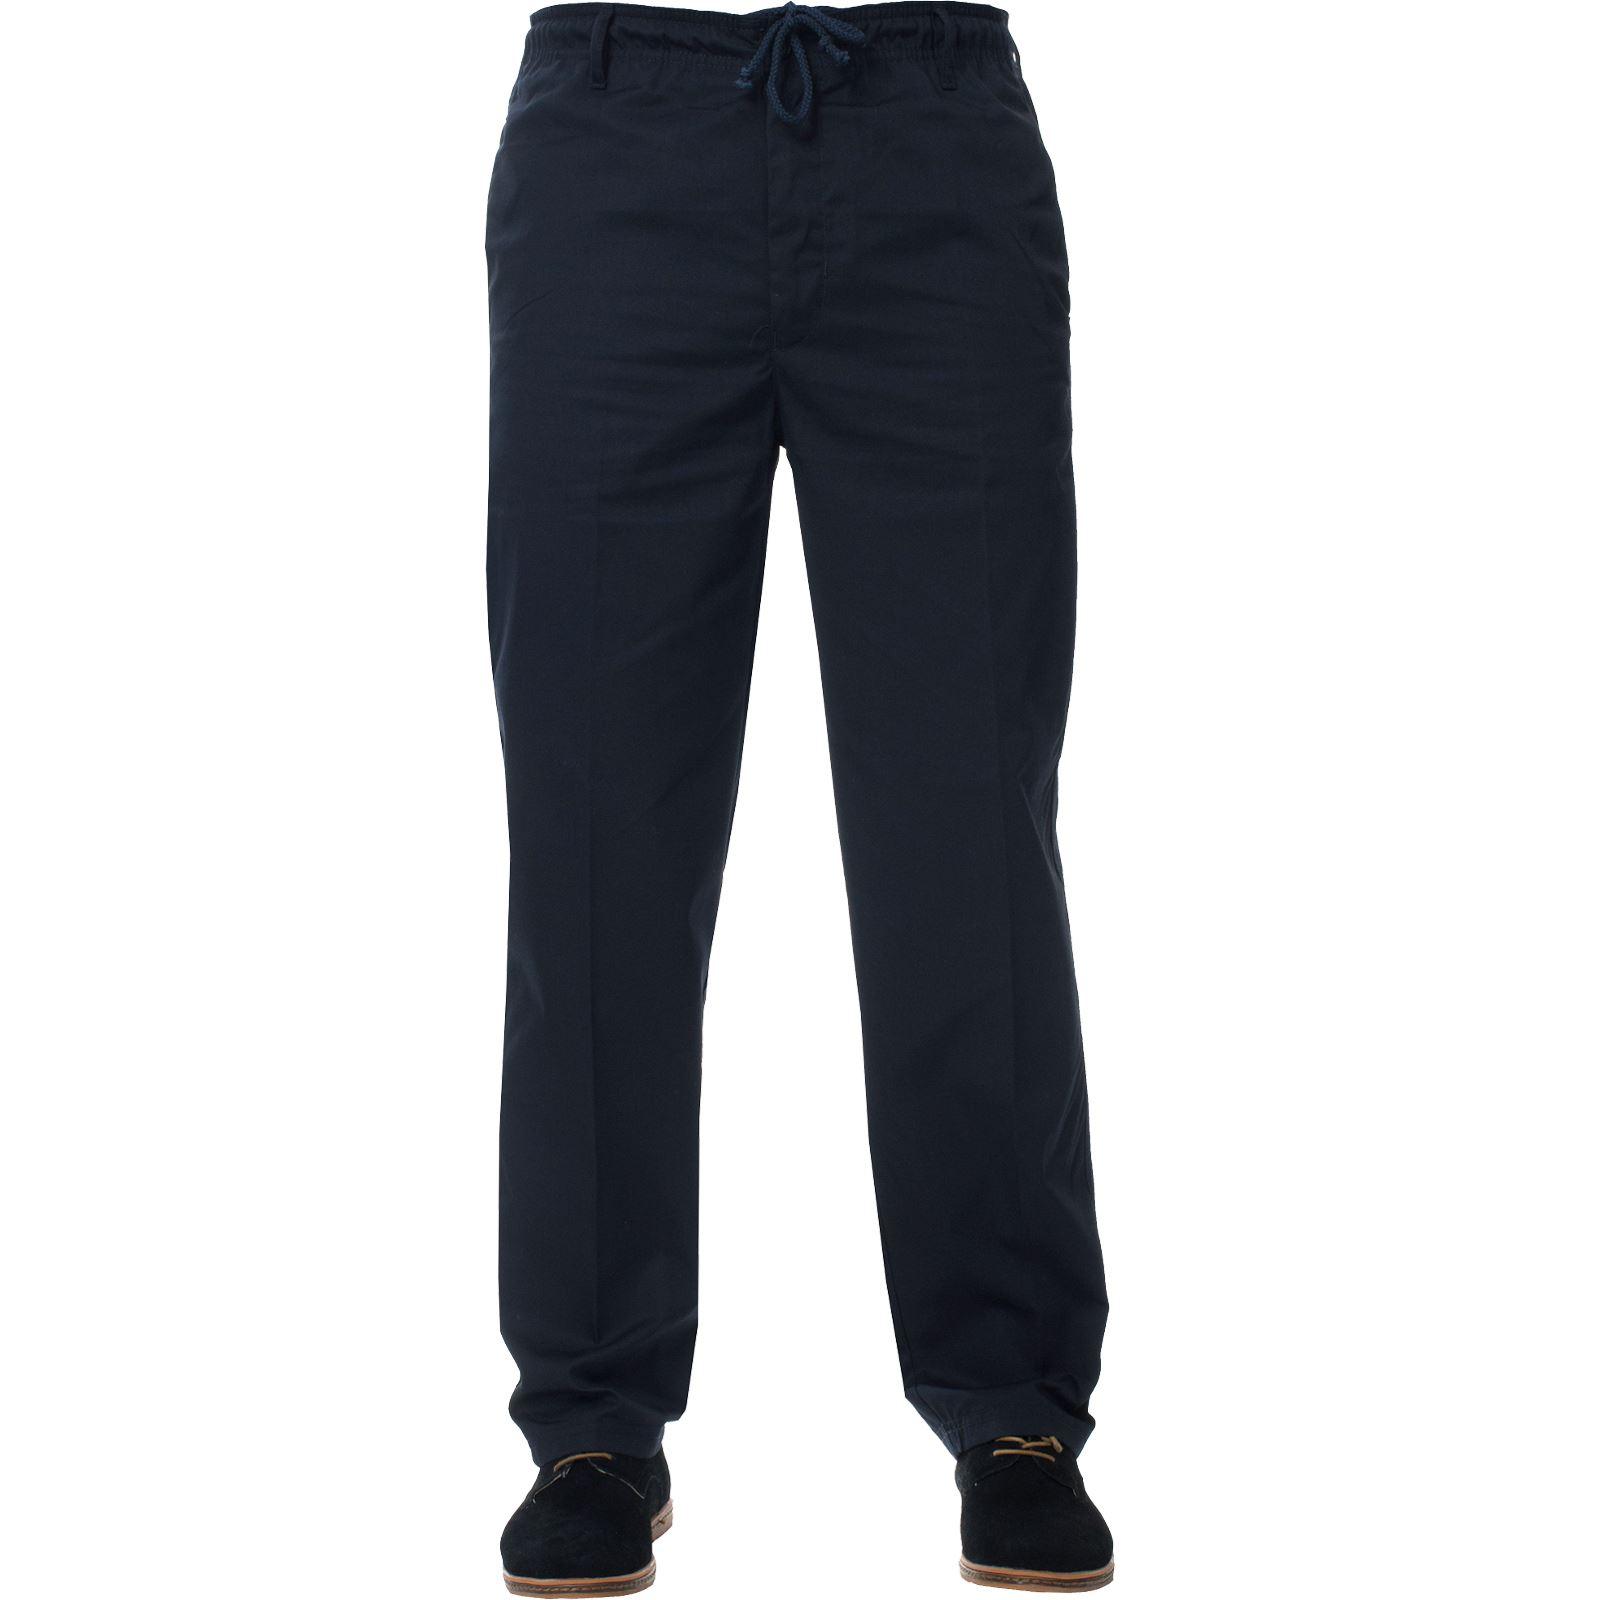 Para-Hombres-Pantalones-De-Rugby-Kruze-cintura-elastica-con-cordon-pantalones-REGULAR-King-Tamanos miniatura 8